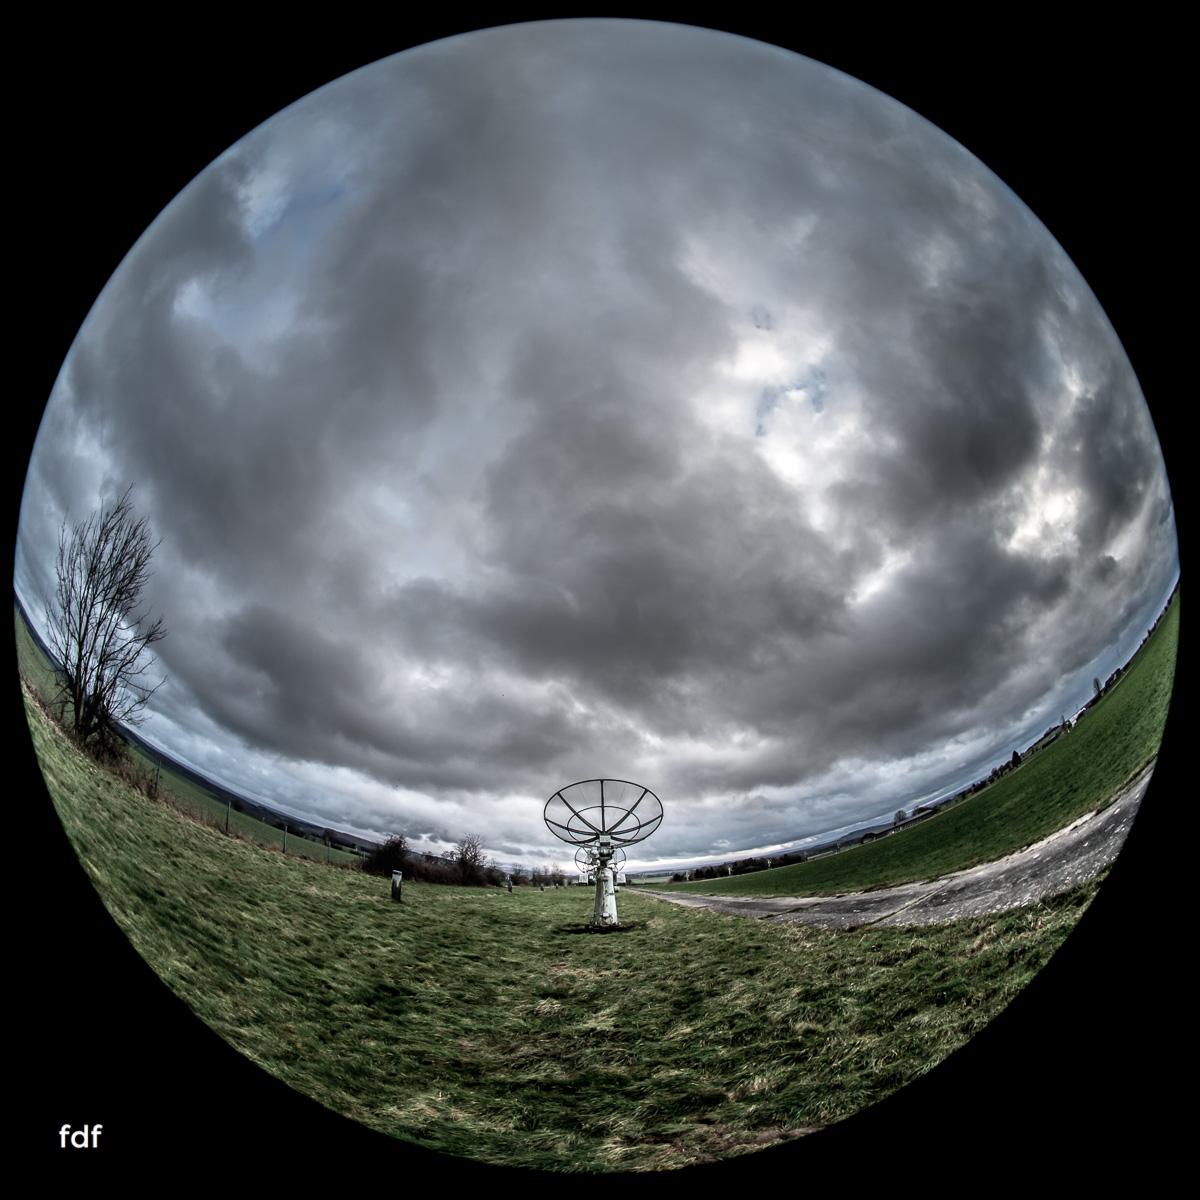 Outer-Space-Radioteleskop-Antennen-Belgien-Urbex-Los-Place-15.jpg